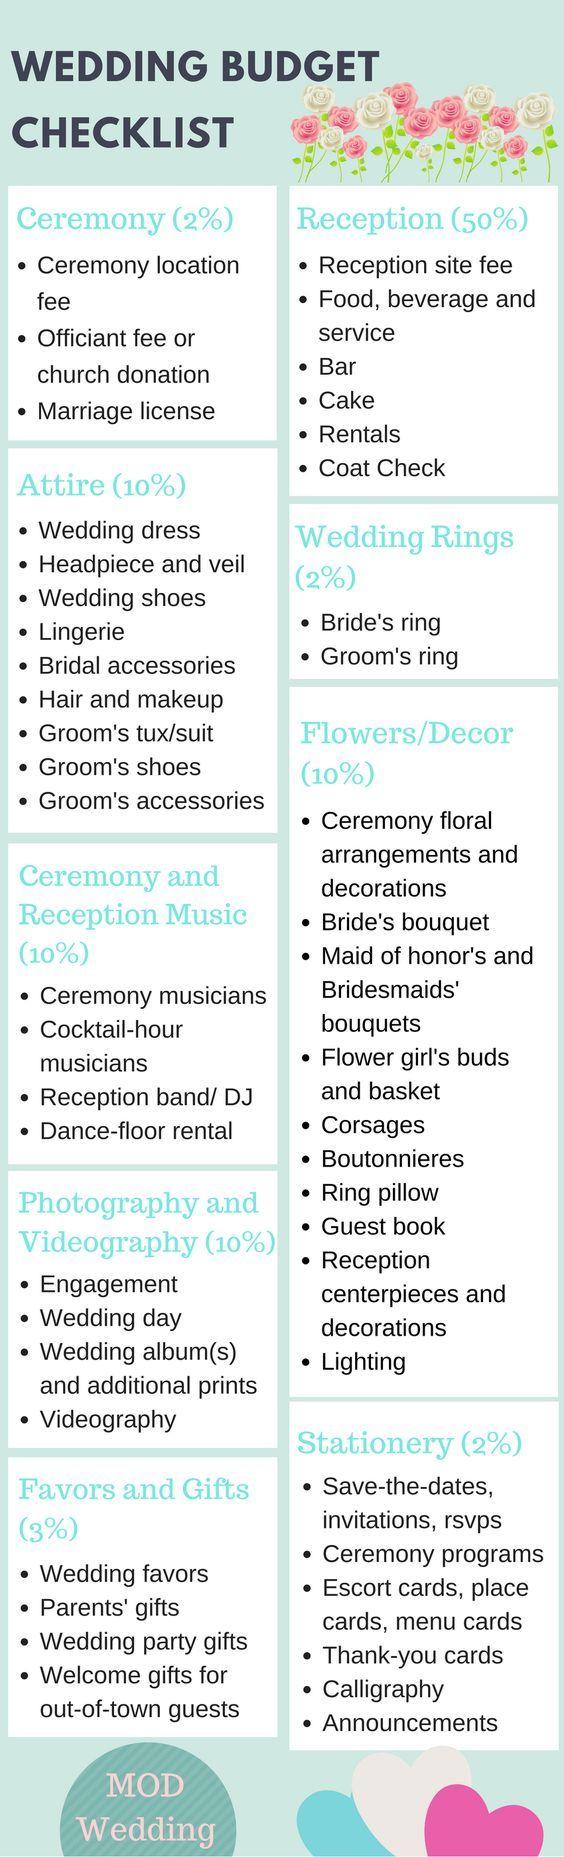 wedding budget checklist wedding ideas pinterest wedding